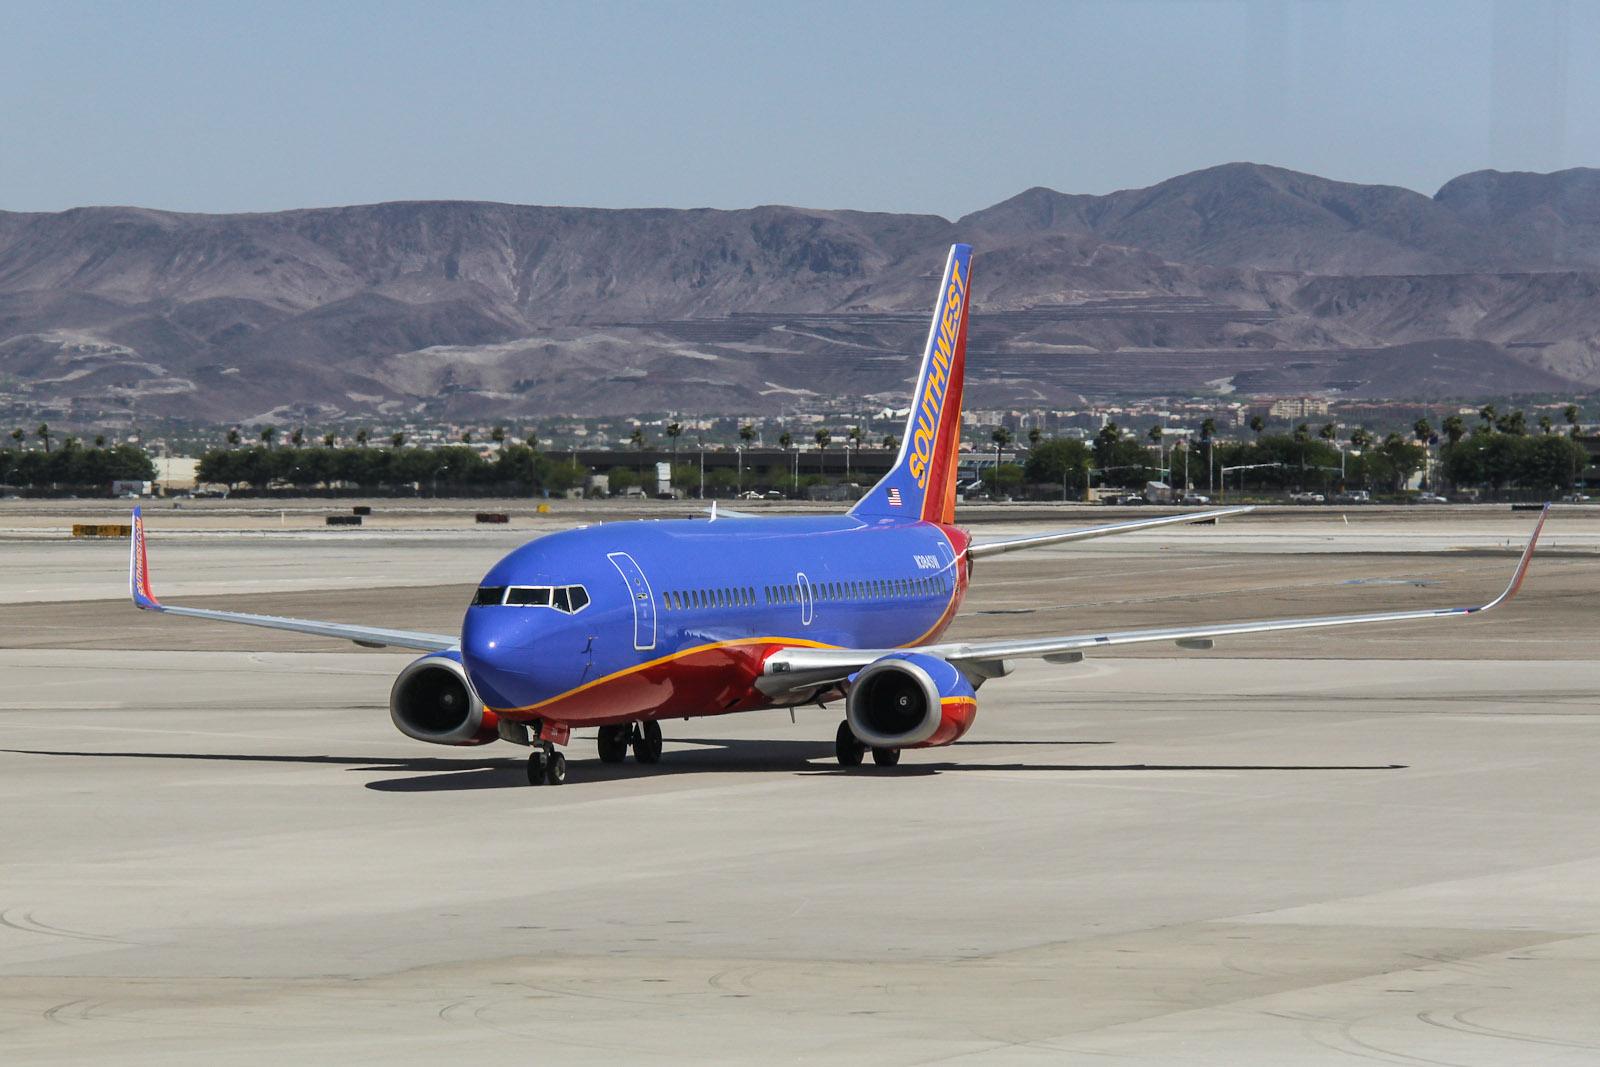 Boeing 737-300 N384SW авиакомпании Southwest в аэропорту Лас-Вегас Мак-Каран